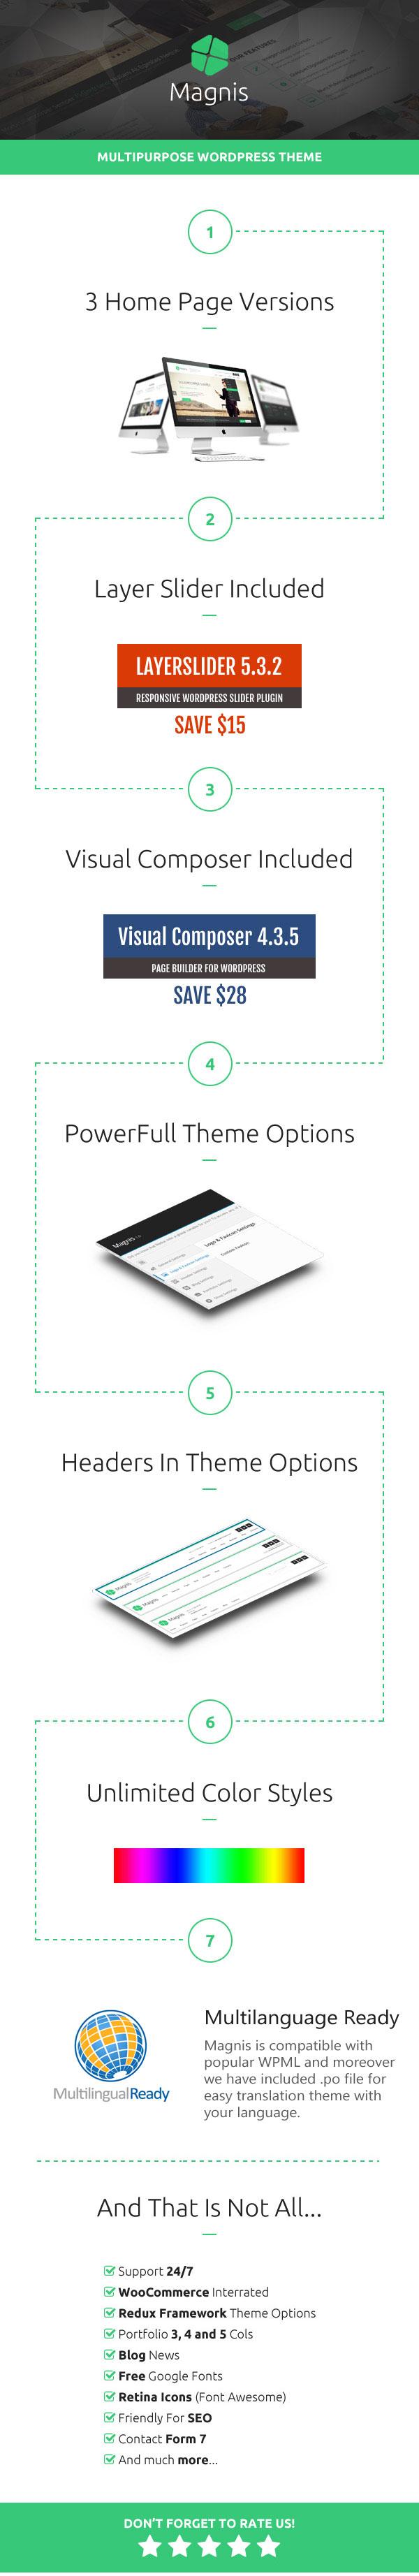 Description Magnis - Corporate Multipurpose WordPress Theme